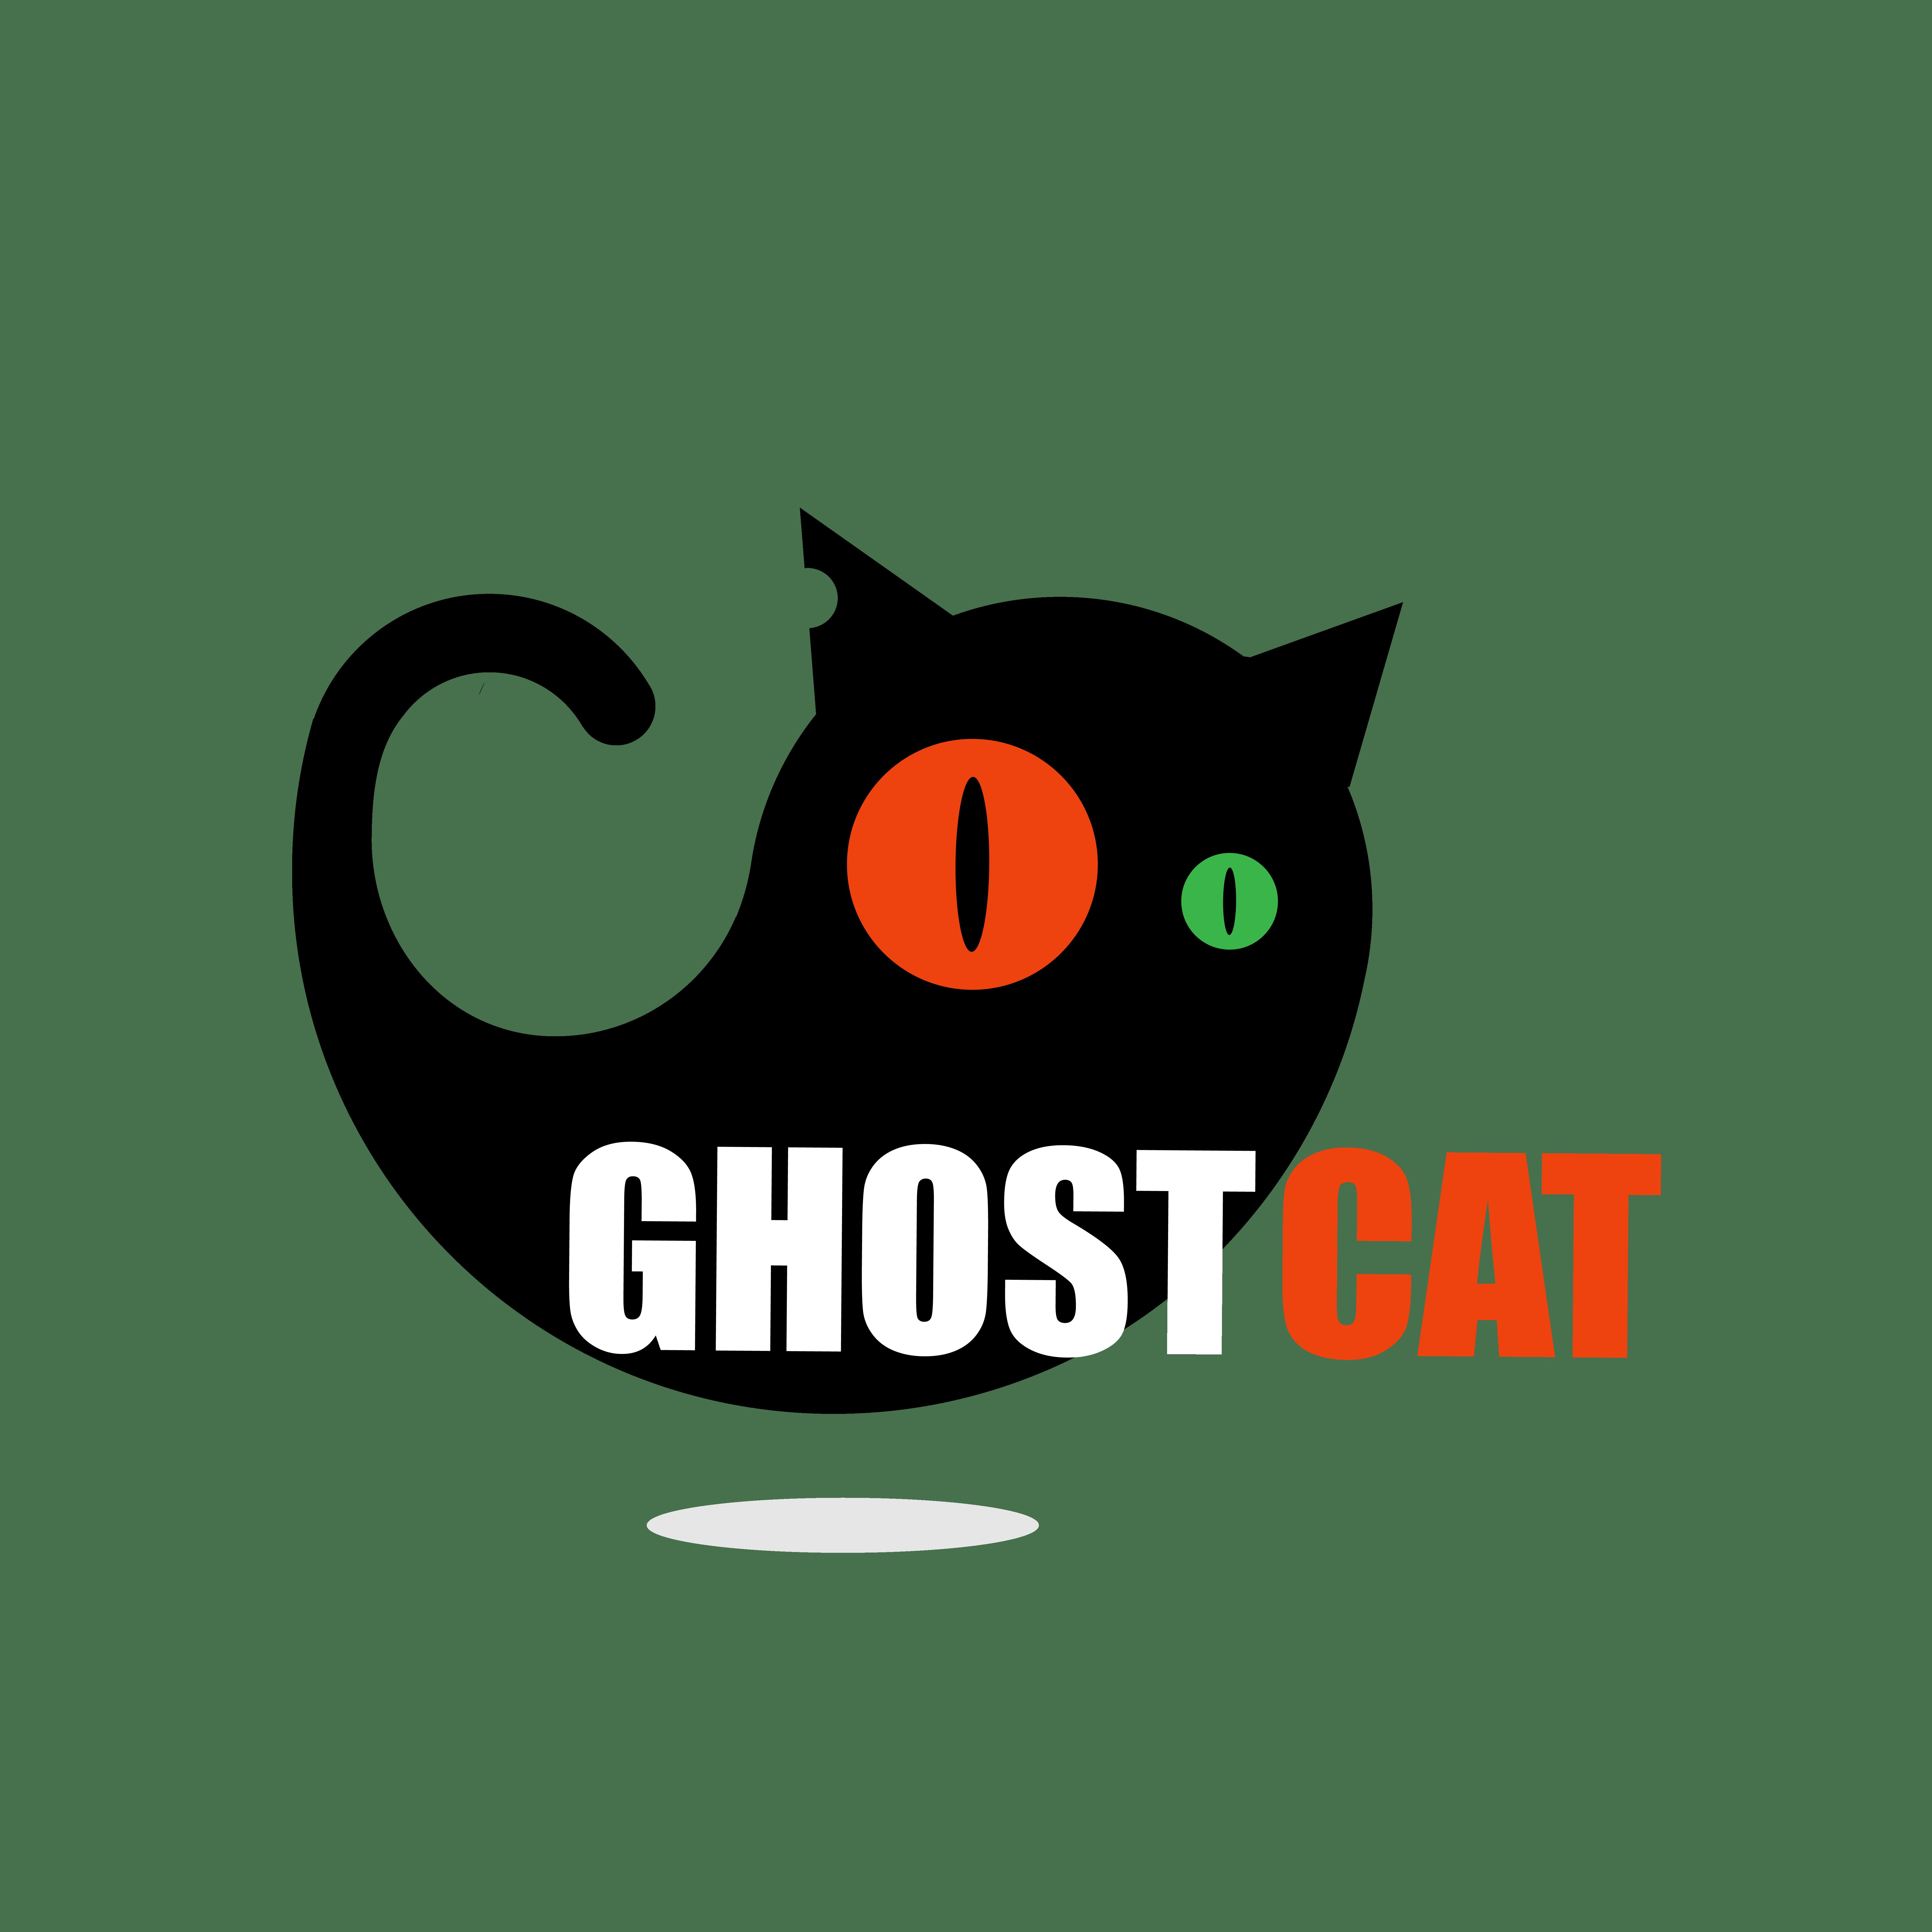 https://www.chaitin.cn/img/ghostcat/ghostcat.png